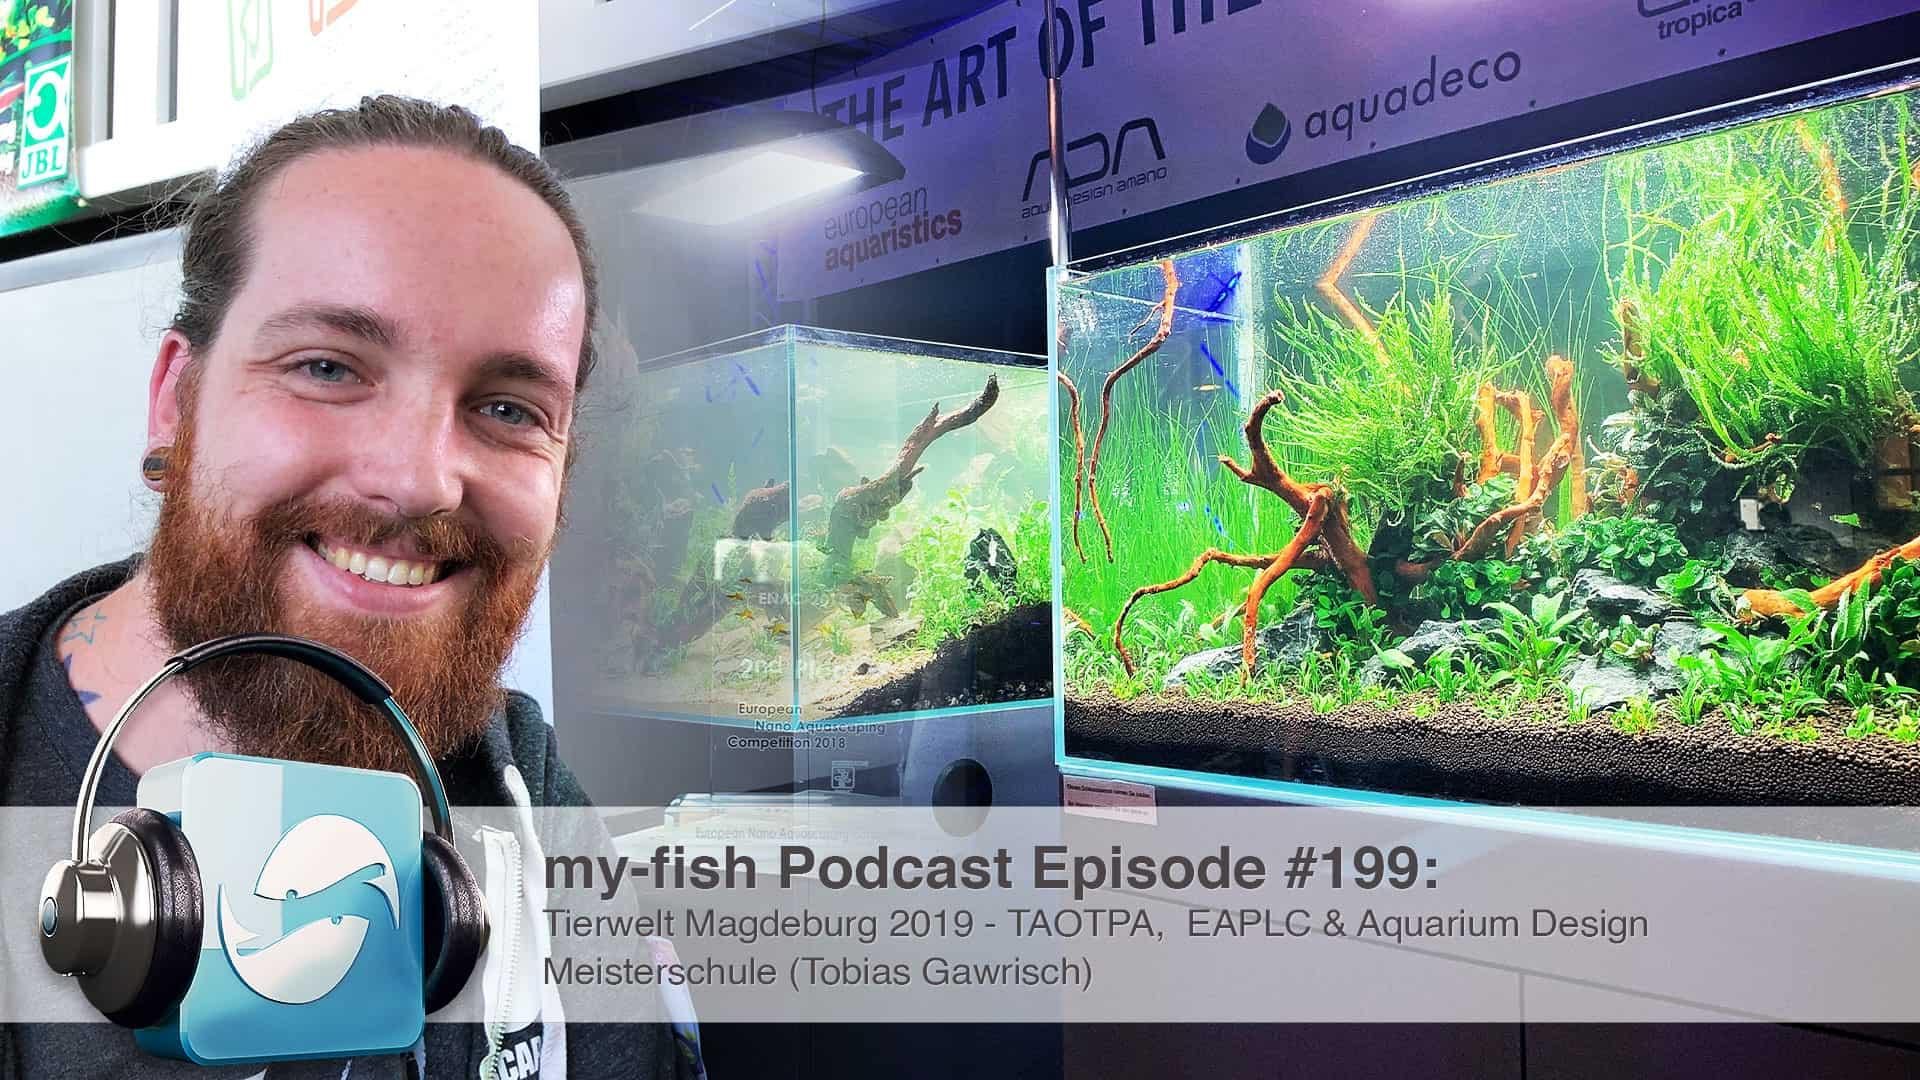 199 - Tierwelt Magdeburg 2019 - TAOTPA, EAPLC & Aquarium Design Meisterschule (Tobias Gawrisch) 1